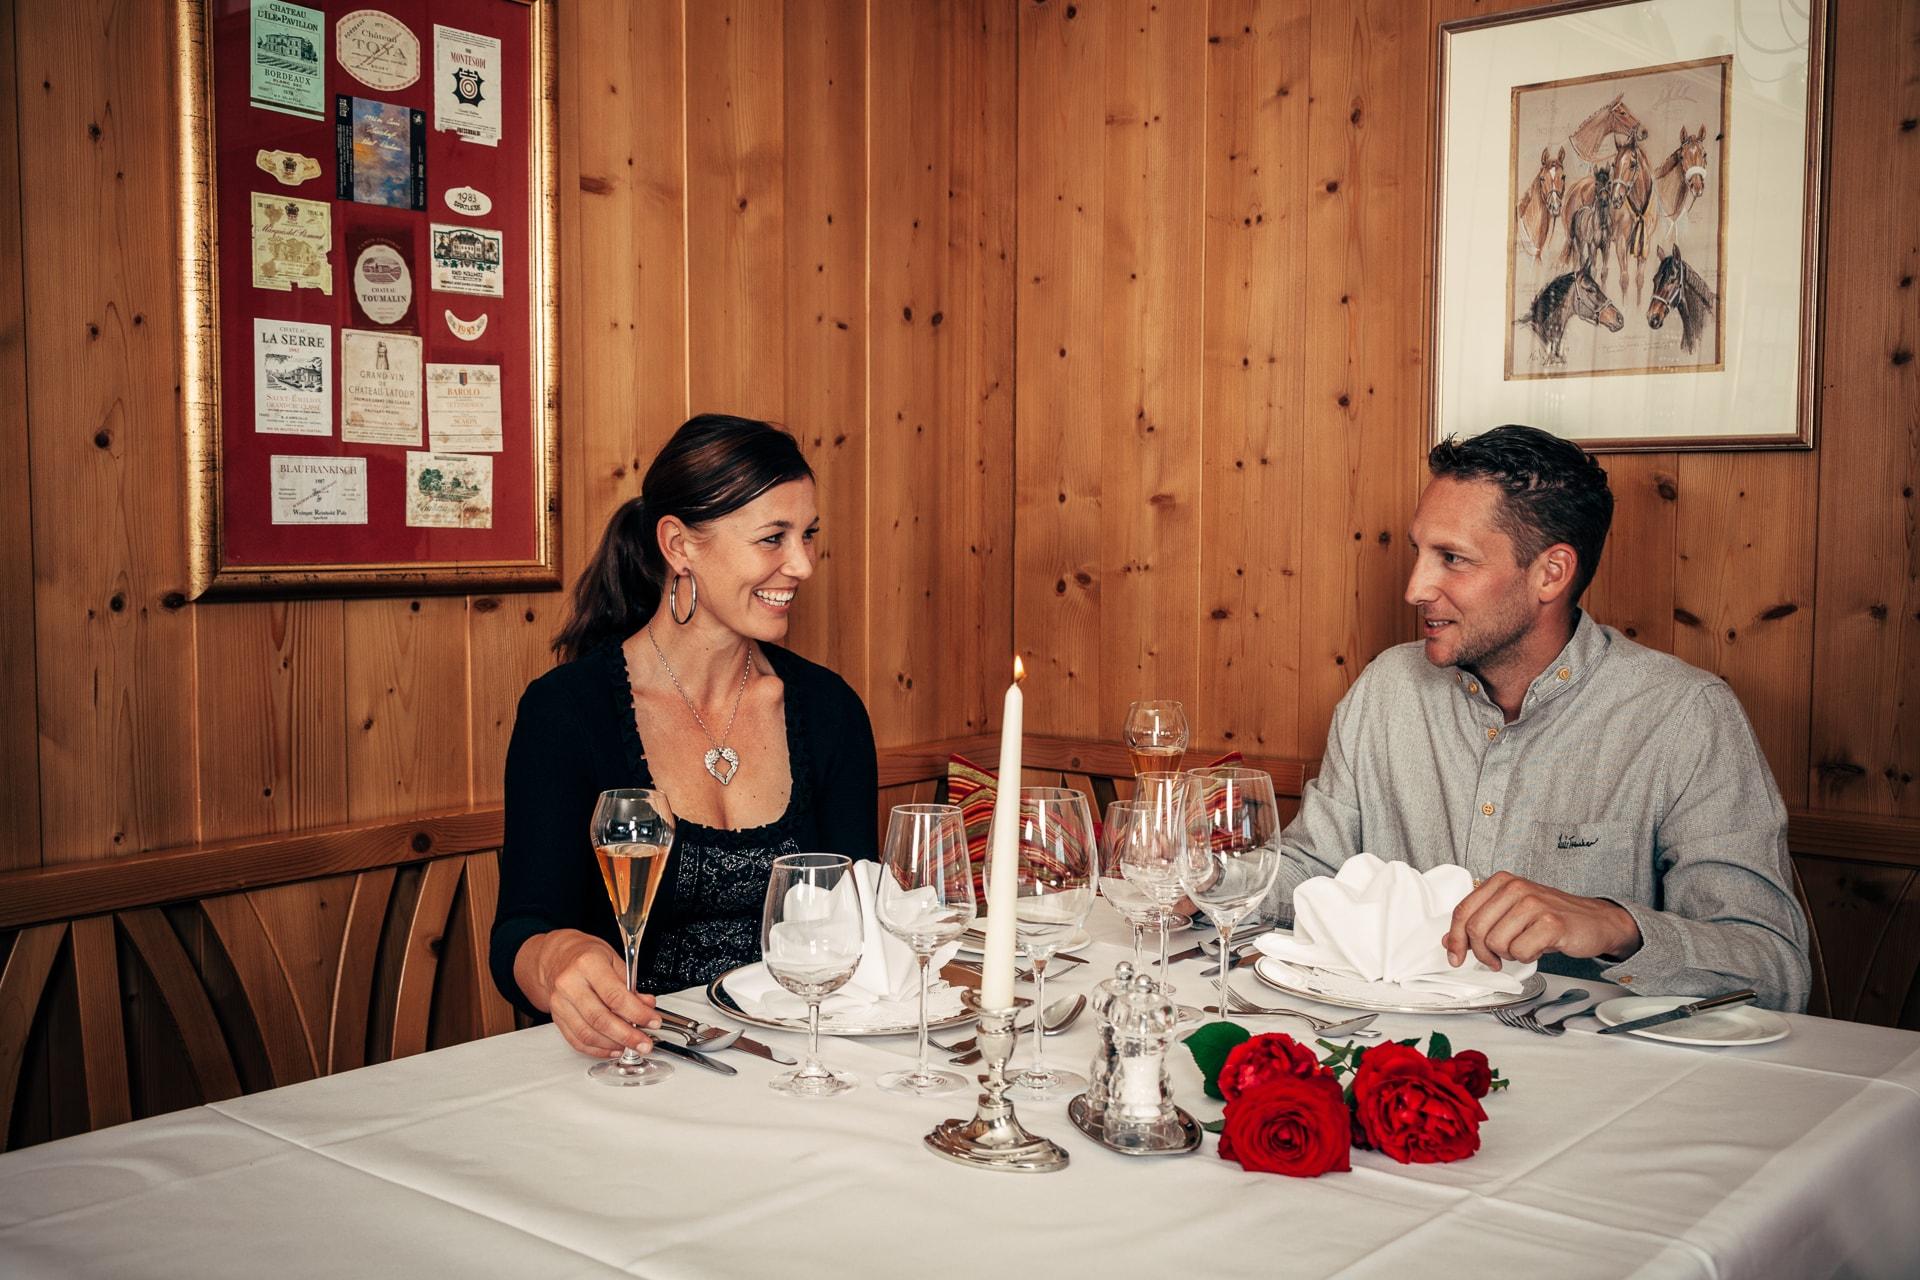 dienstlgut-candle-light-dinner